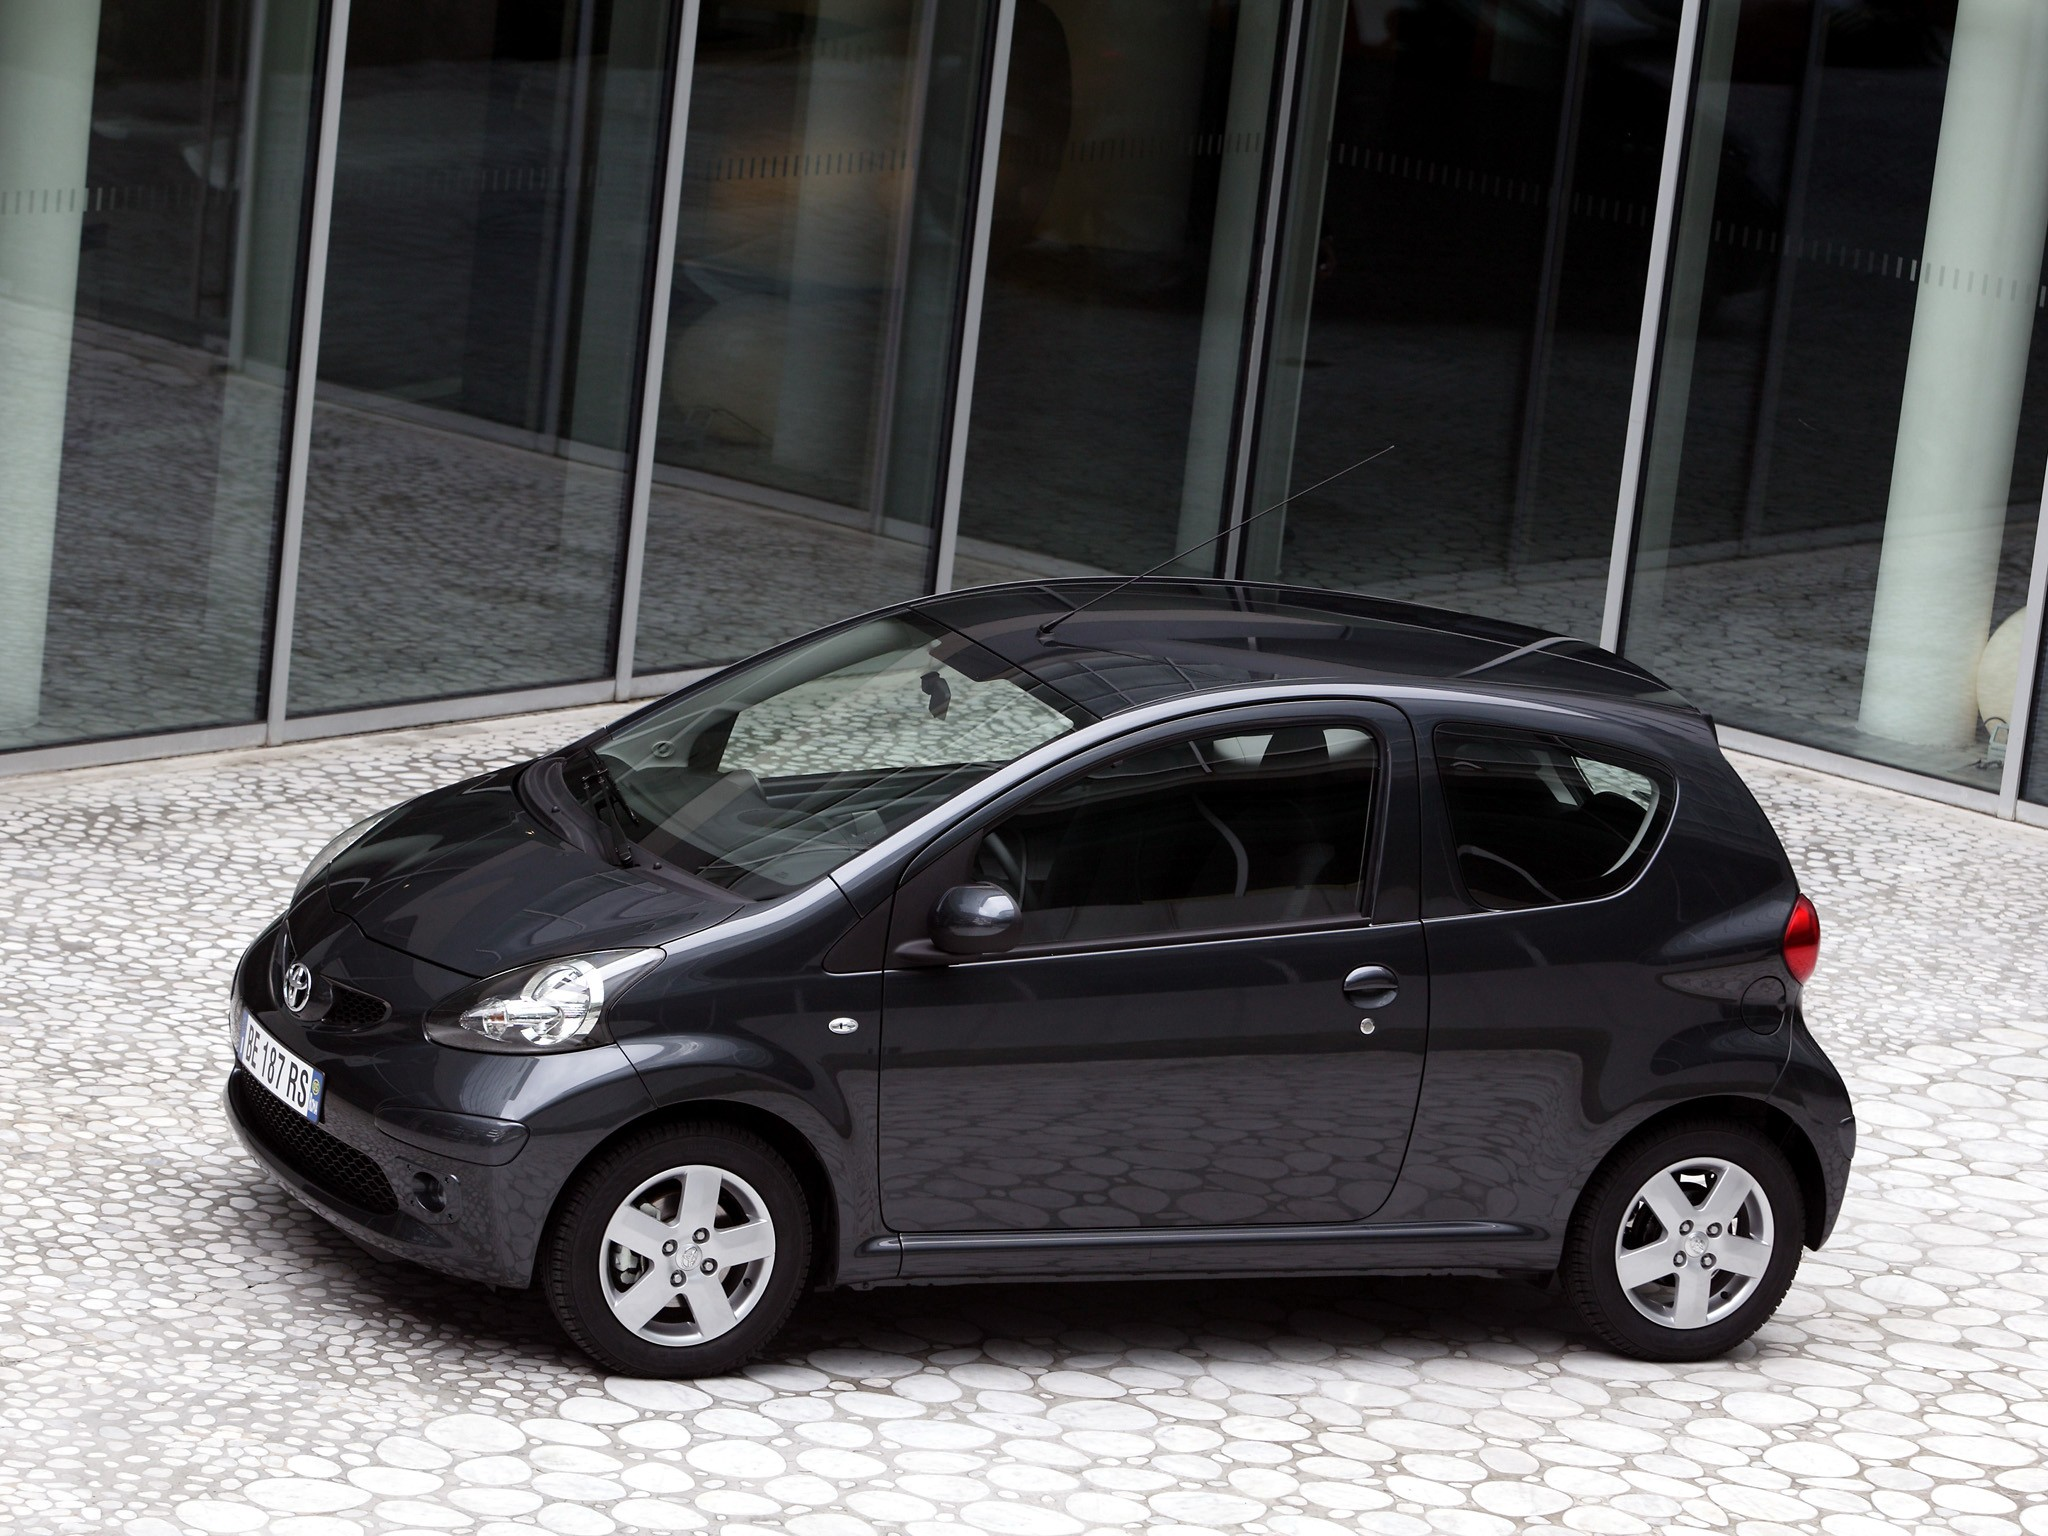 Toyota Rav4 Hybrid Used >> TOYOTA Aygo 3 doors specs & photos - 2005, 2006, 2007, 2008 - autoevolution